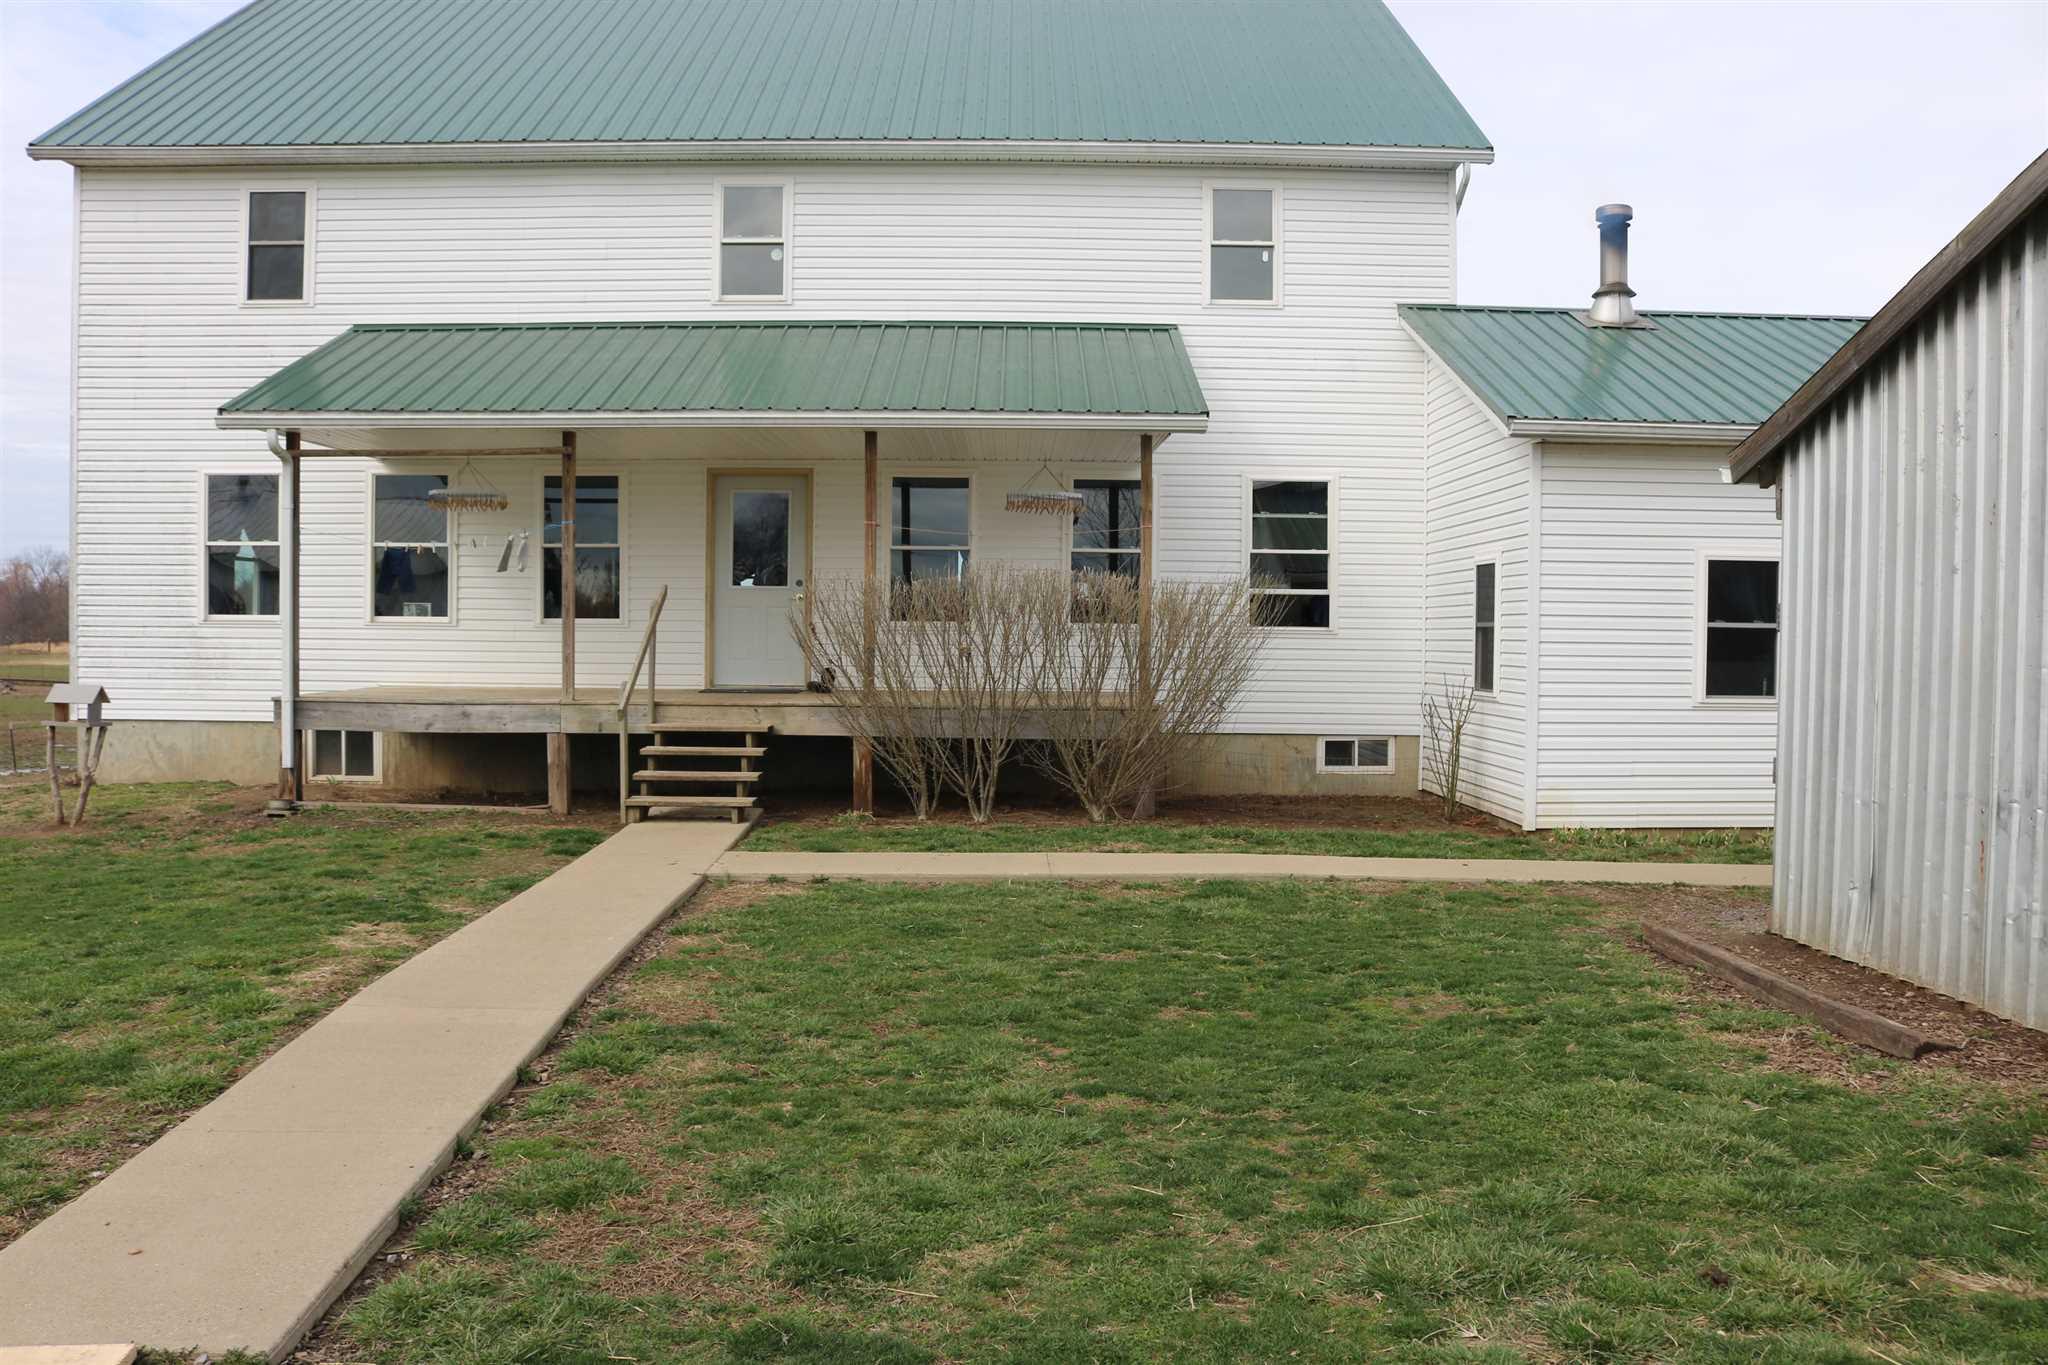 24100 E BROWN Property Photo - Thompsonville, IL real estate listing